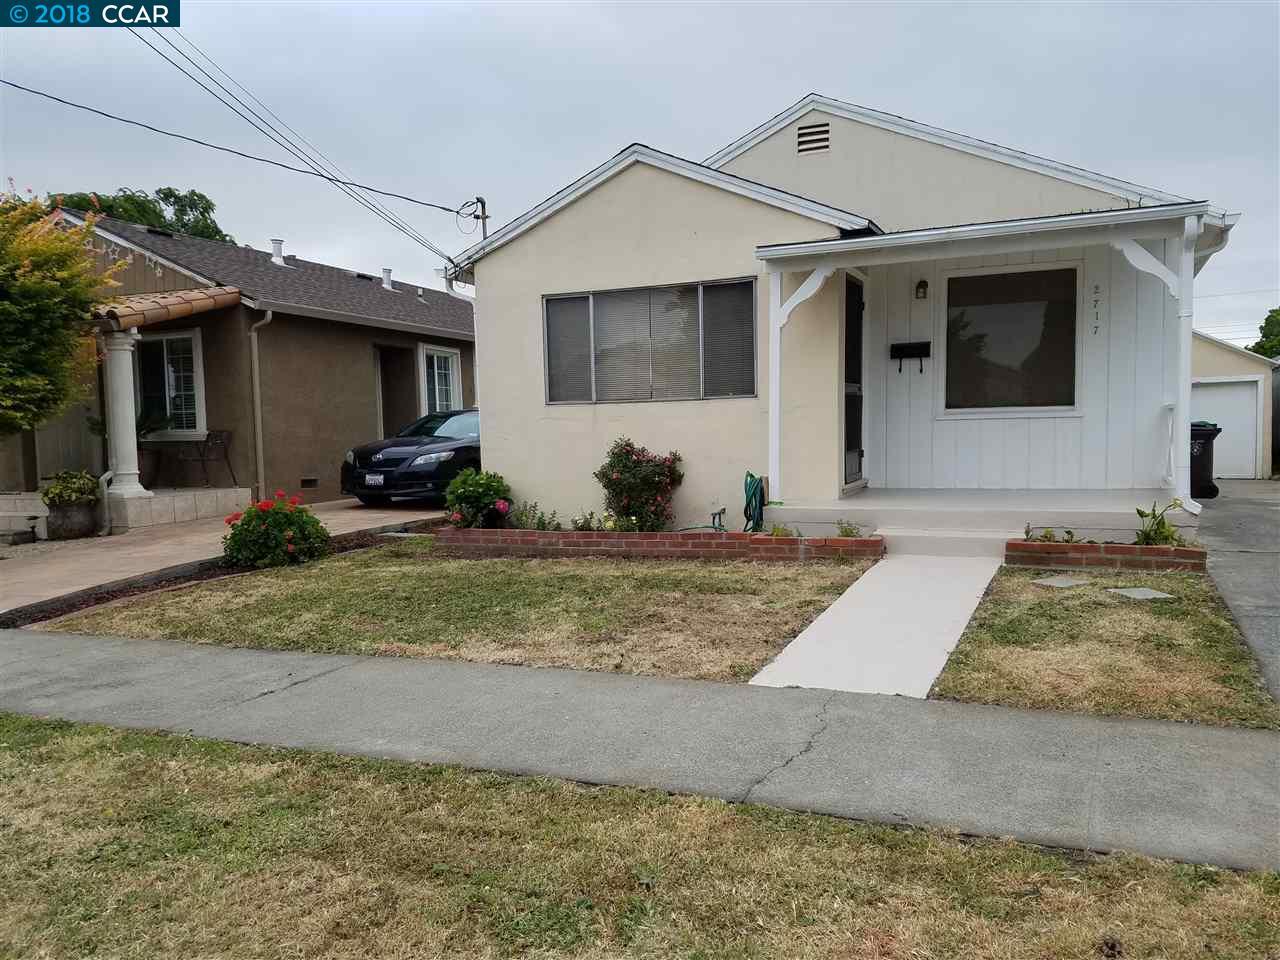 2717 LOWELL AVE, RICHMOND, CA 94804